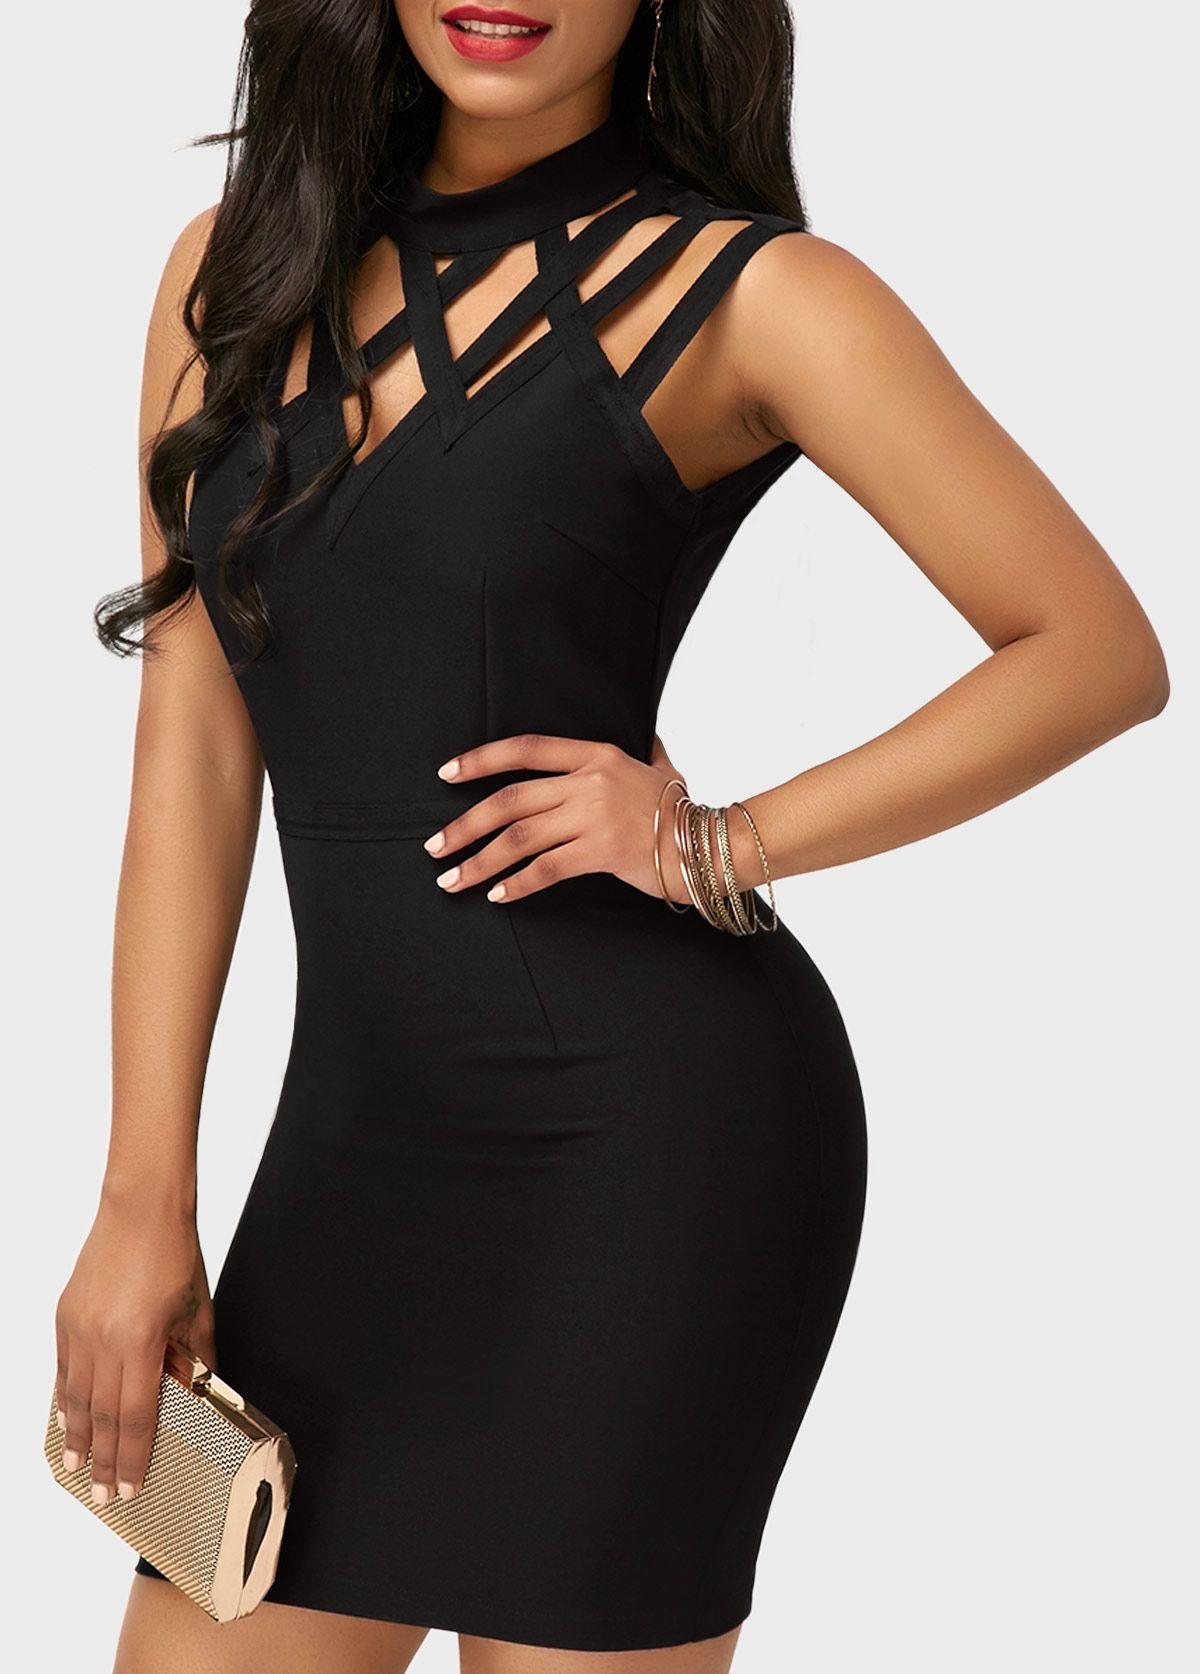 Cutout High Neck Sleeveless Black Sheath Dress  17a835c88